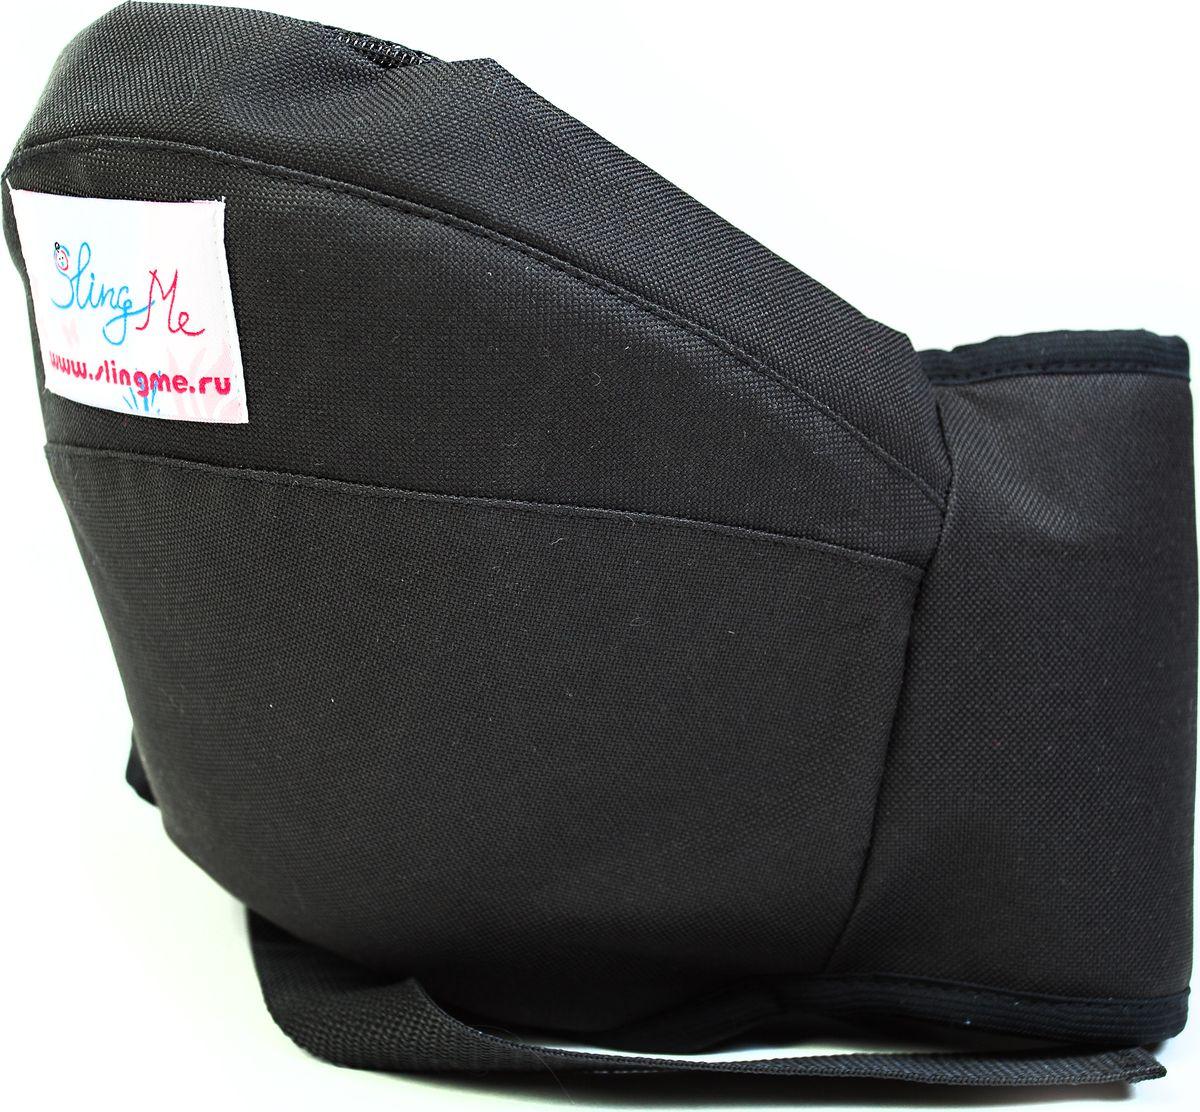 SlingMe Хипсит Ночь плюс slingme рюкзак переноска стронг классик